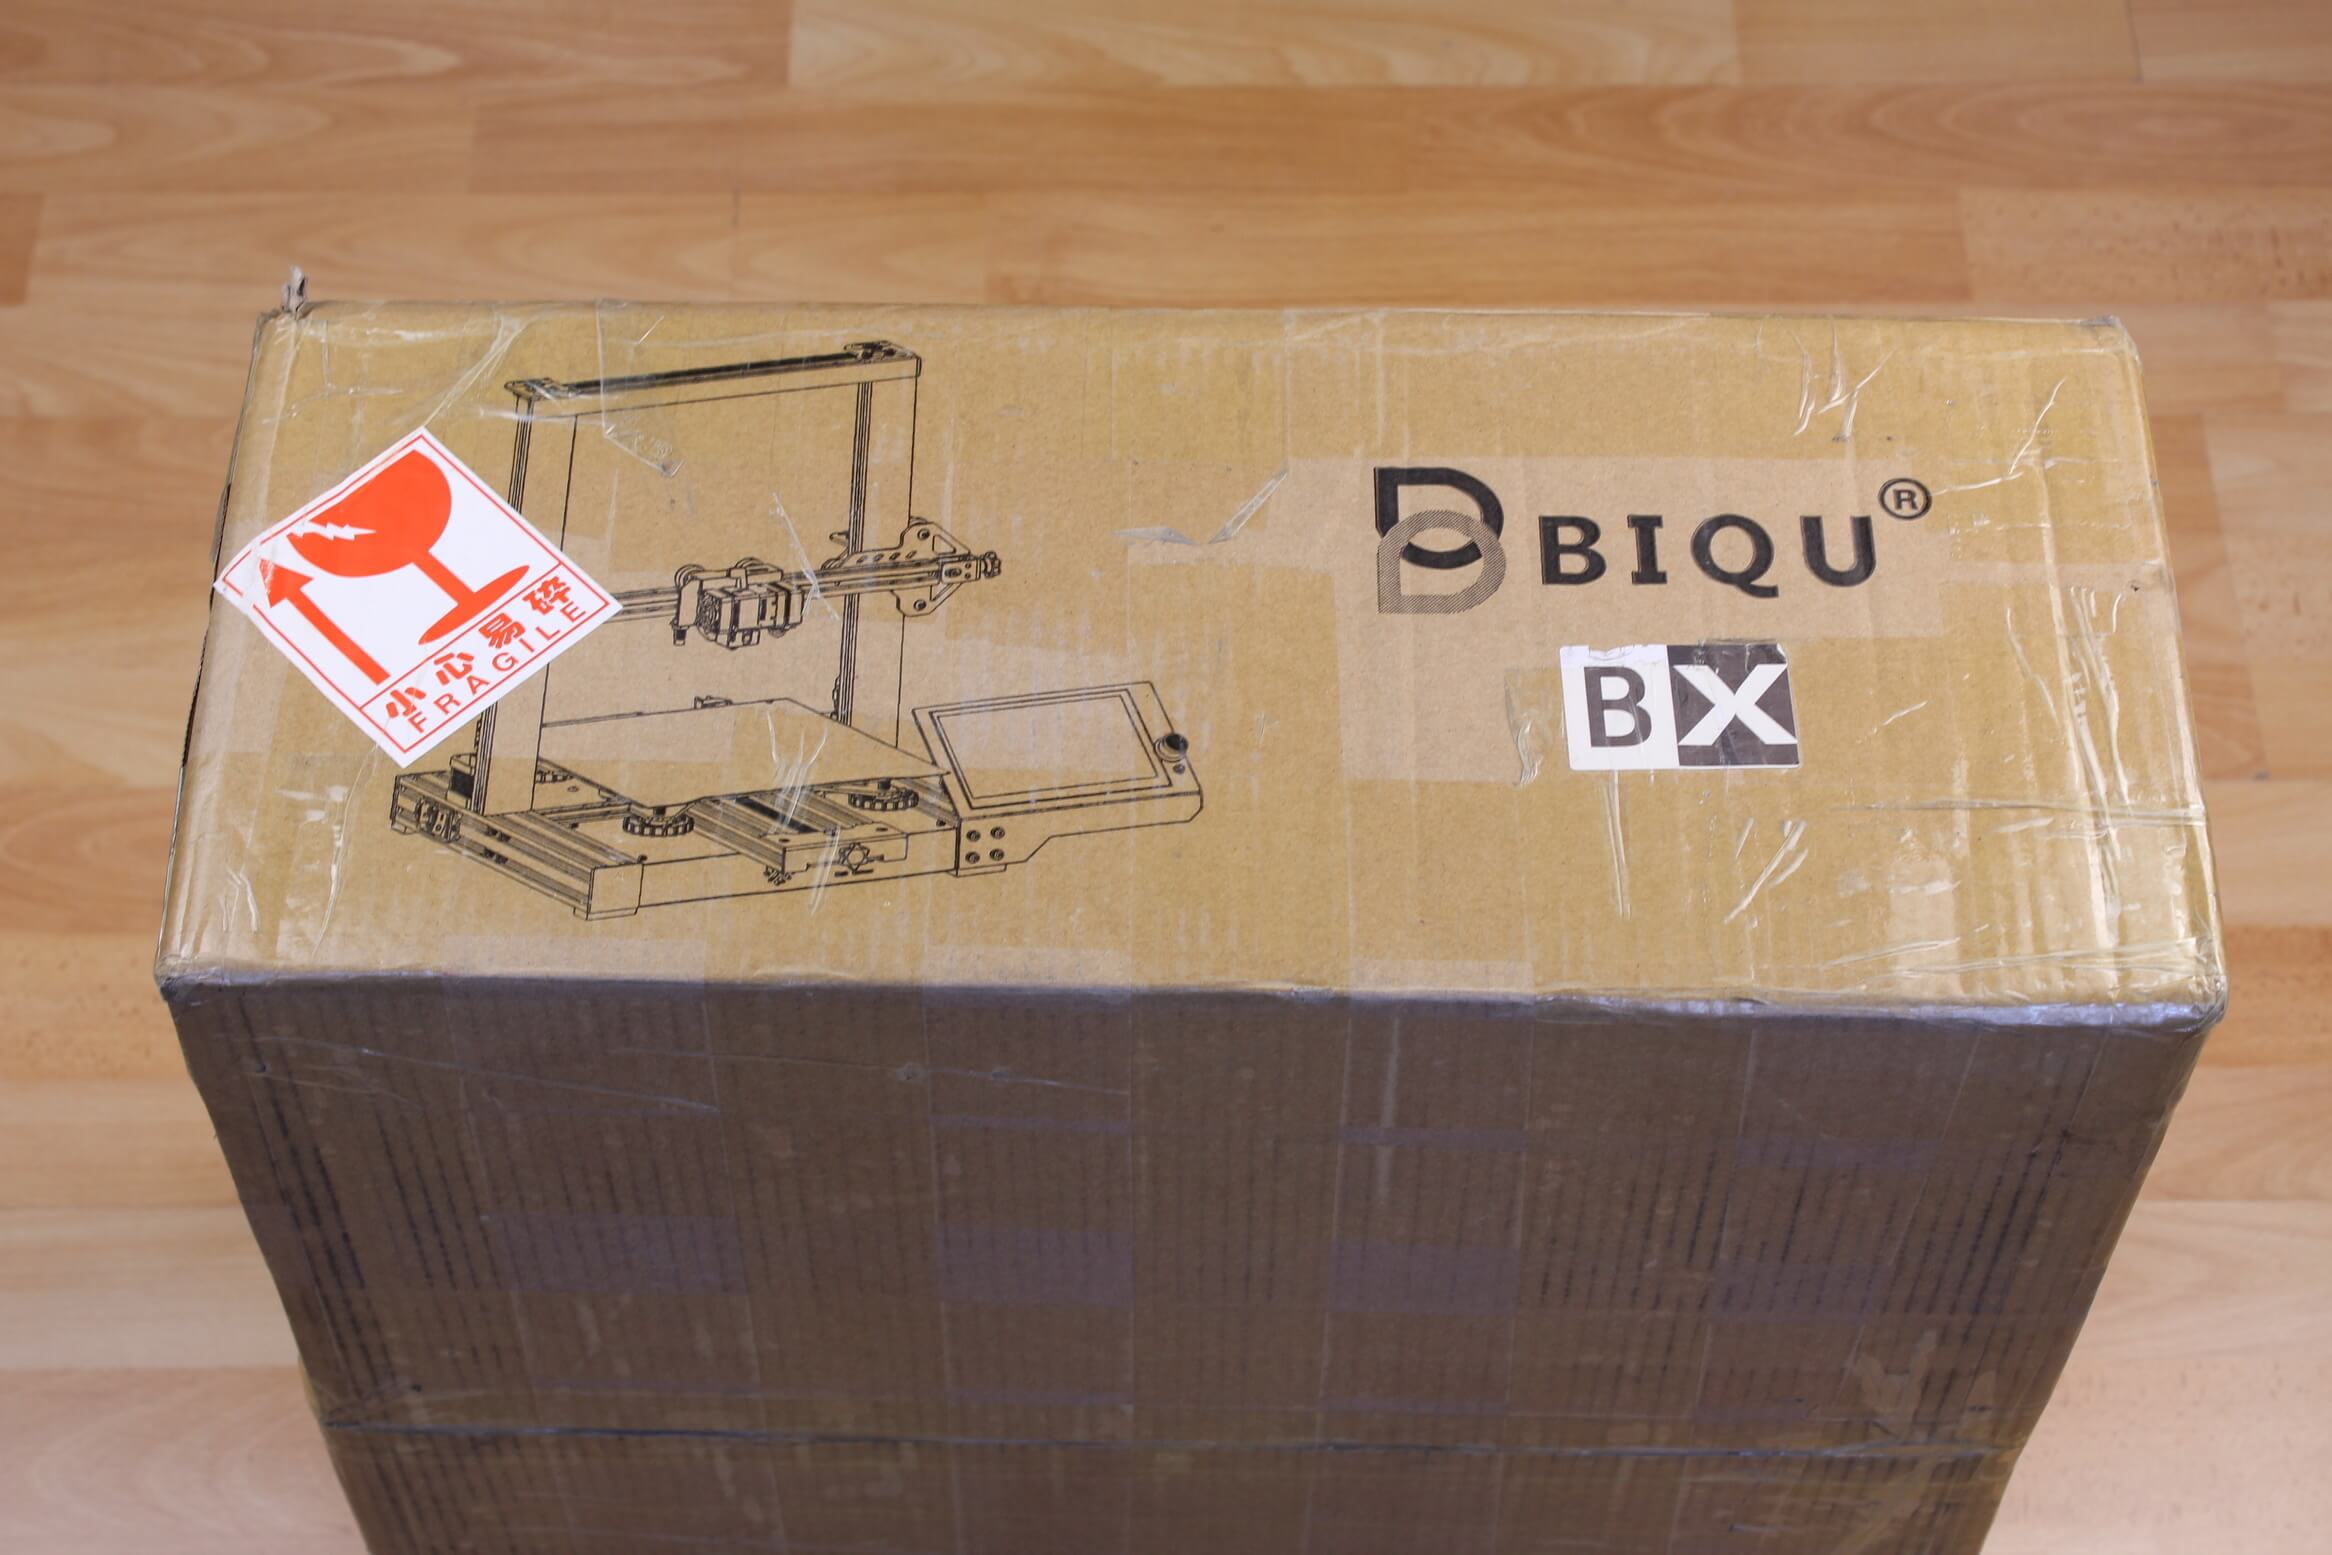 BIQU-BX-Packaging-2